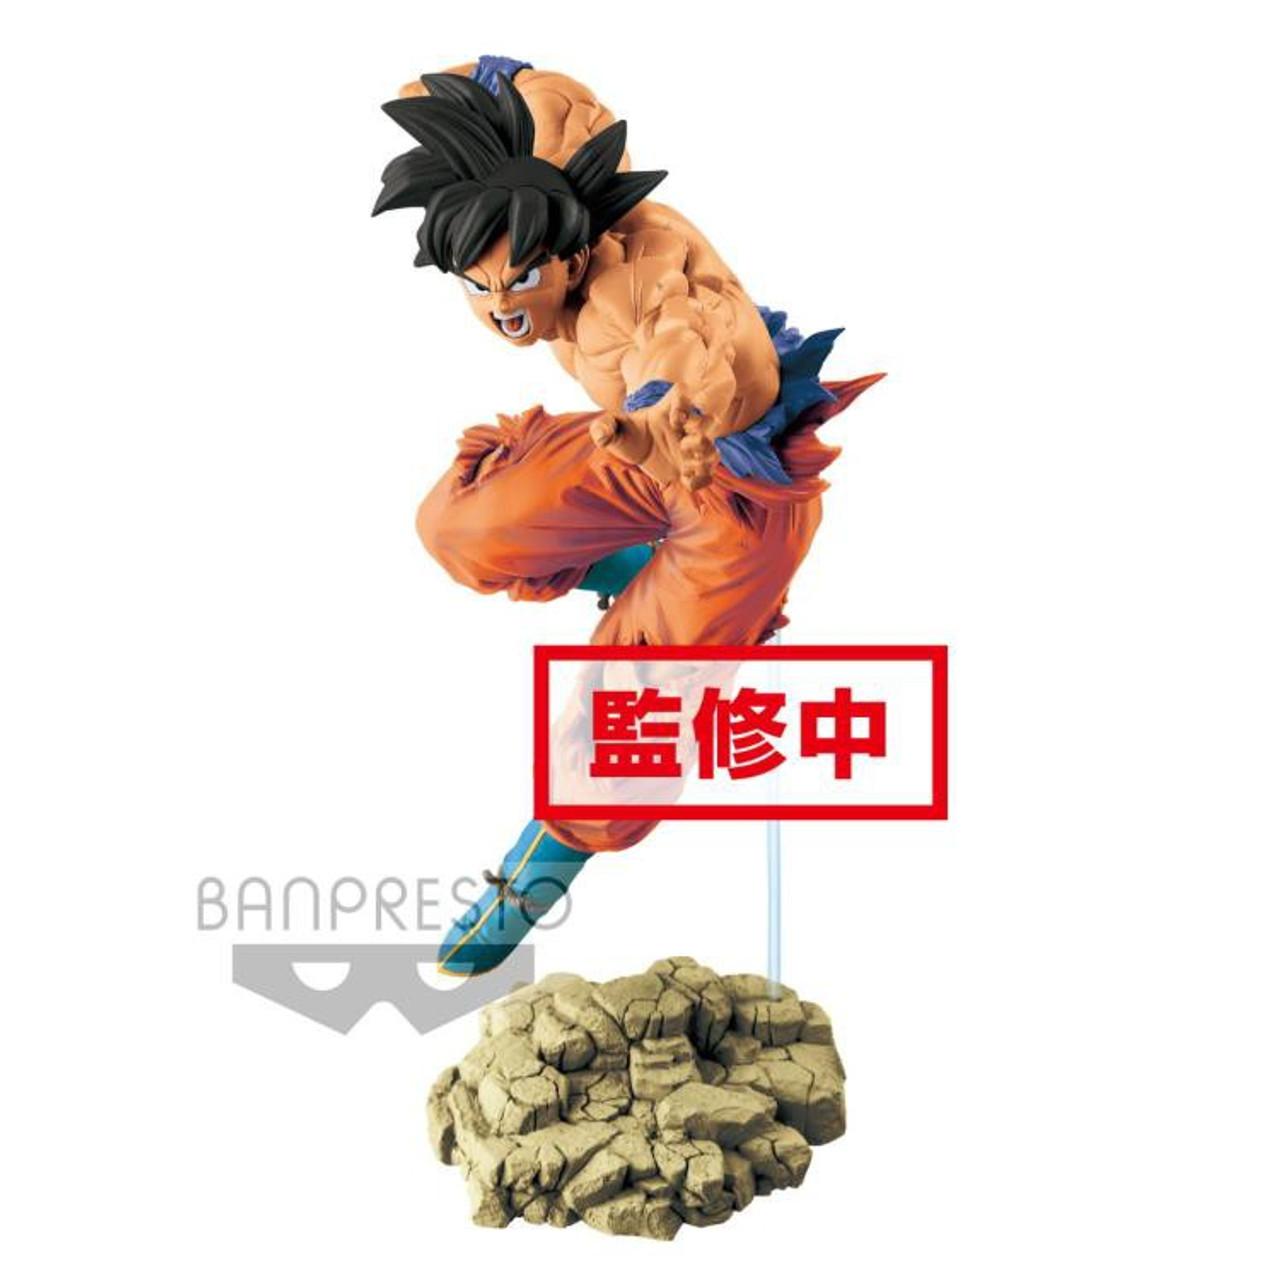 READY Banpresto DRAGON BALL Son Gokou The 20th Film Limited Figure Movie goku